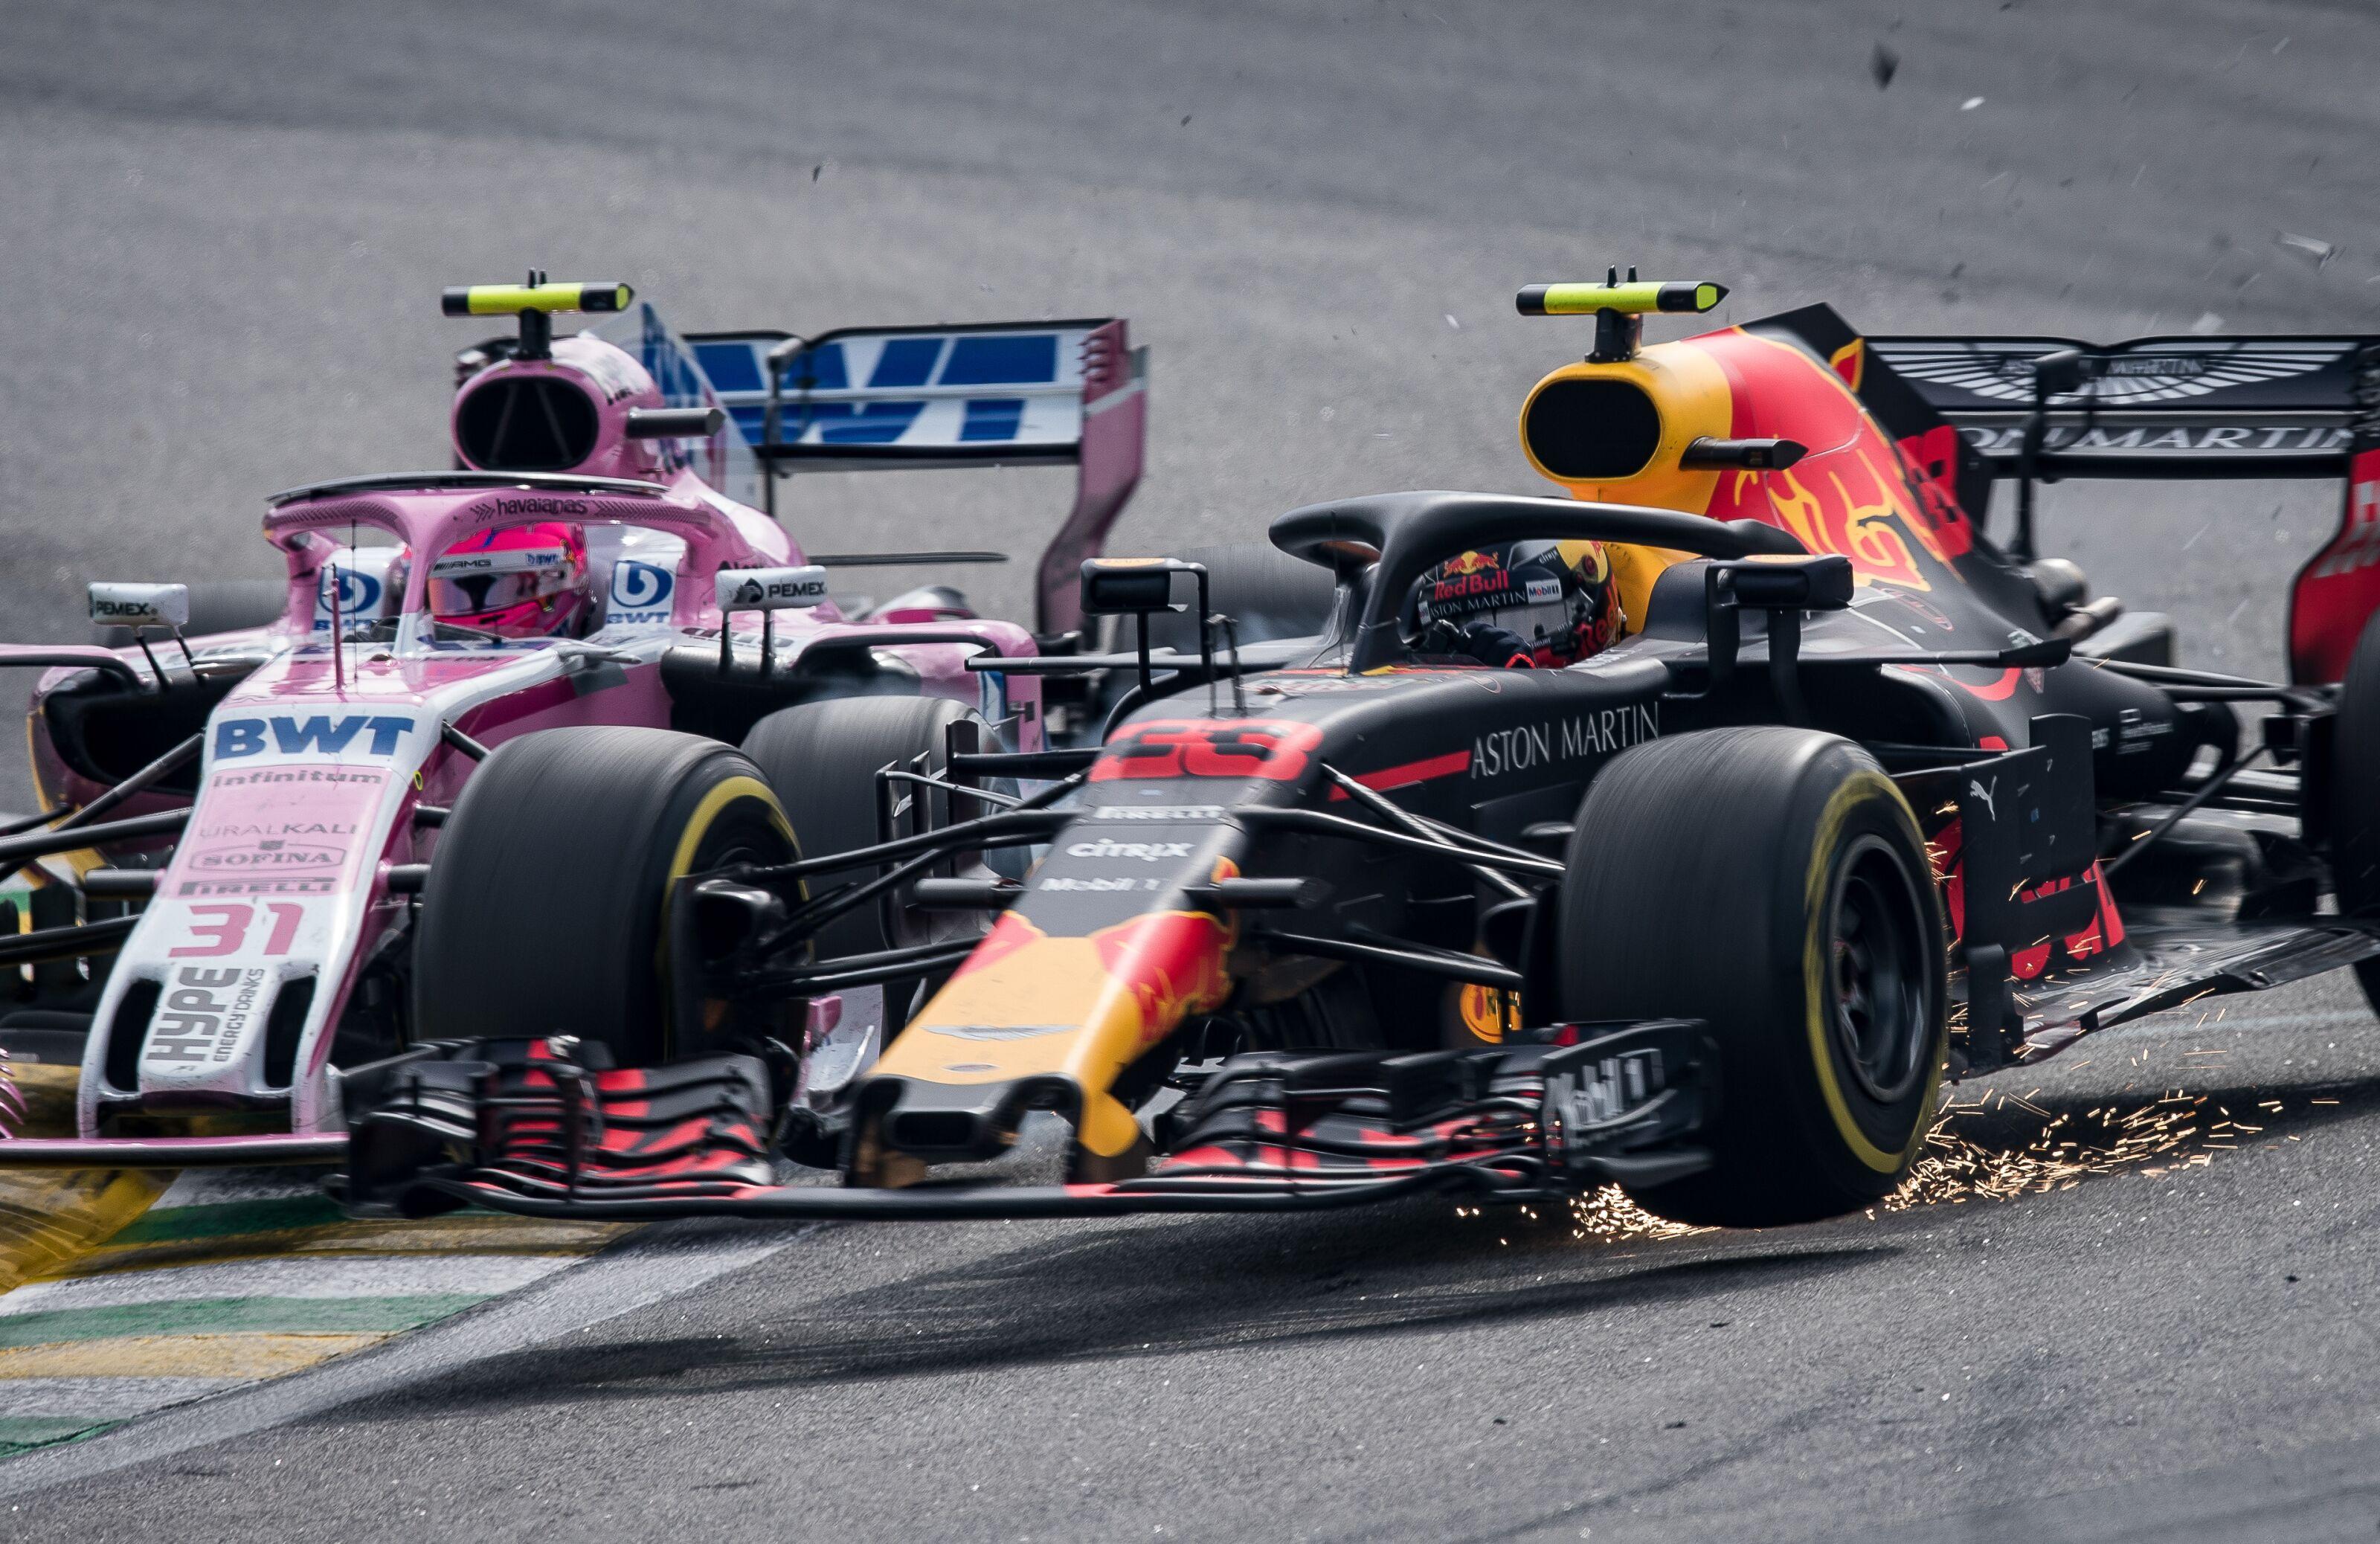 Sao Paulo Brazil November  Max Verstappen Of The Netherlands Driving The